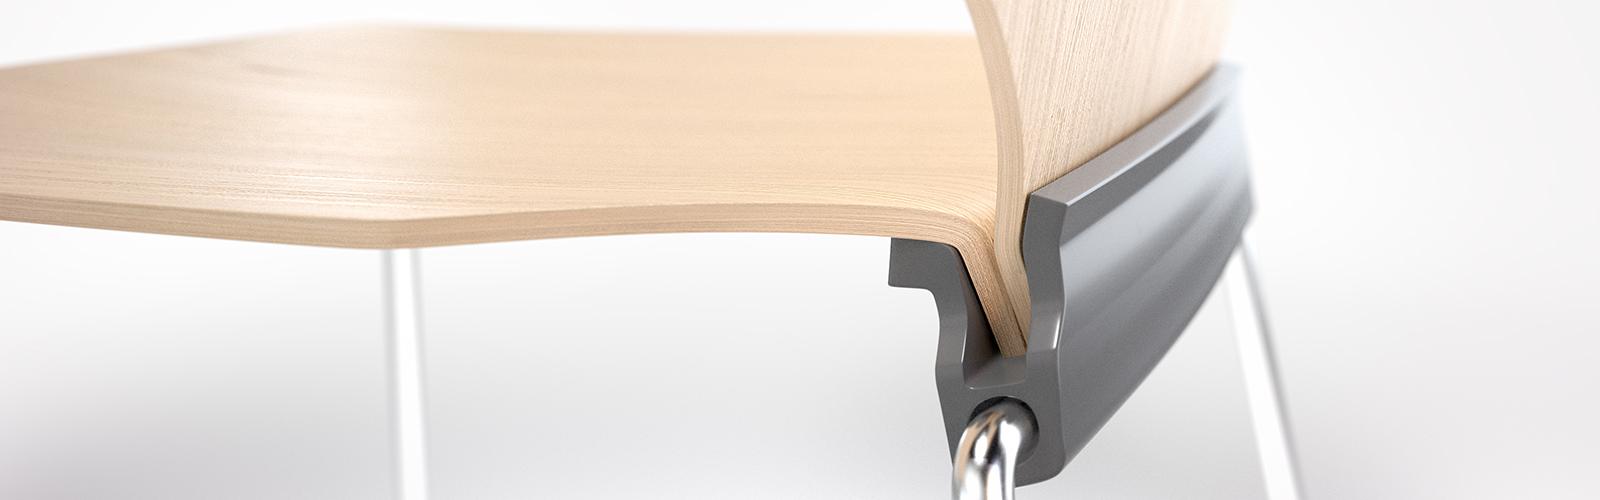 Braunwagner Produkt Industrie Mobility Design modular chair concept 2016